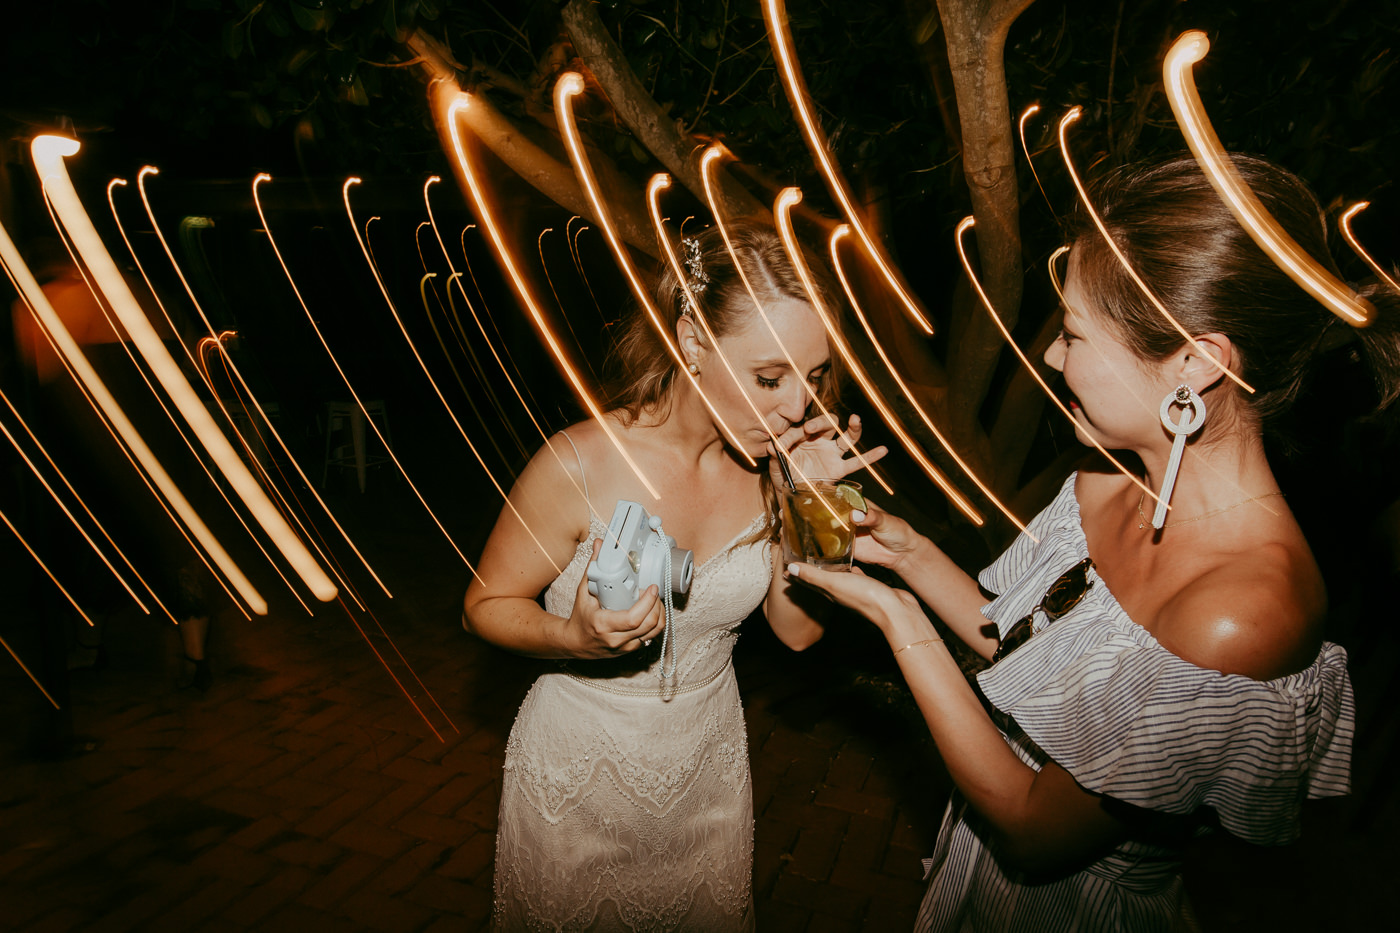 Anthony & Eliet - Wagga Wagga Wedding - Country NSW - Samantha Heather Photography-190.jpg